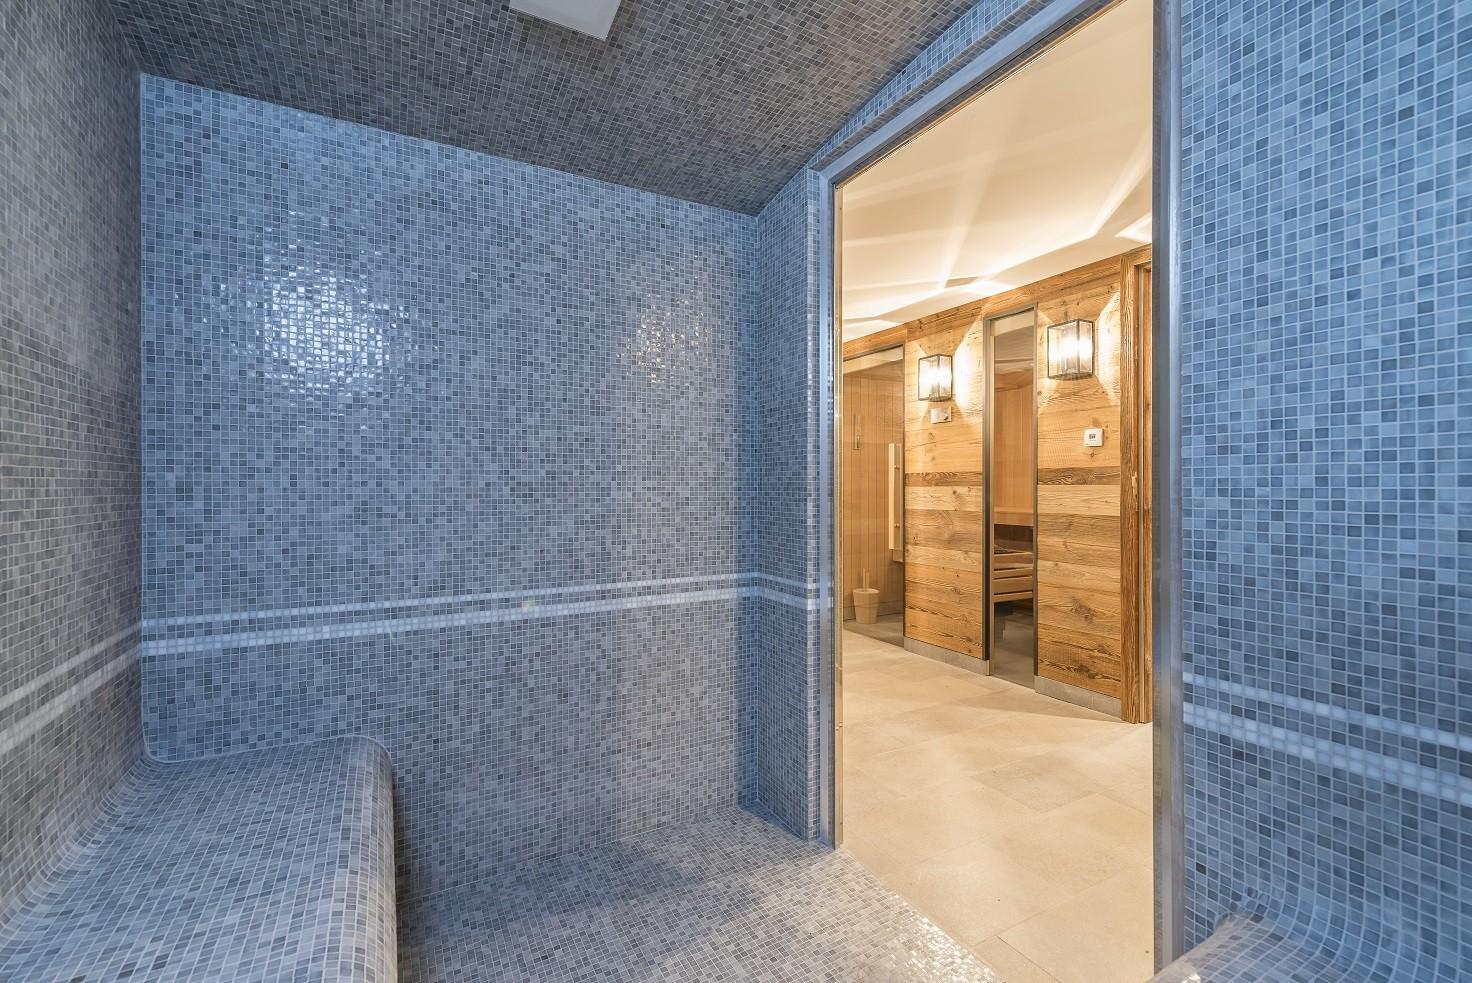 hammam-sauna-2-1472x983-7718